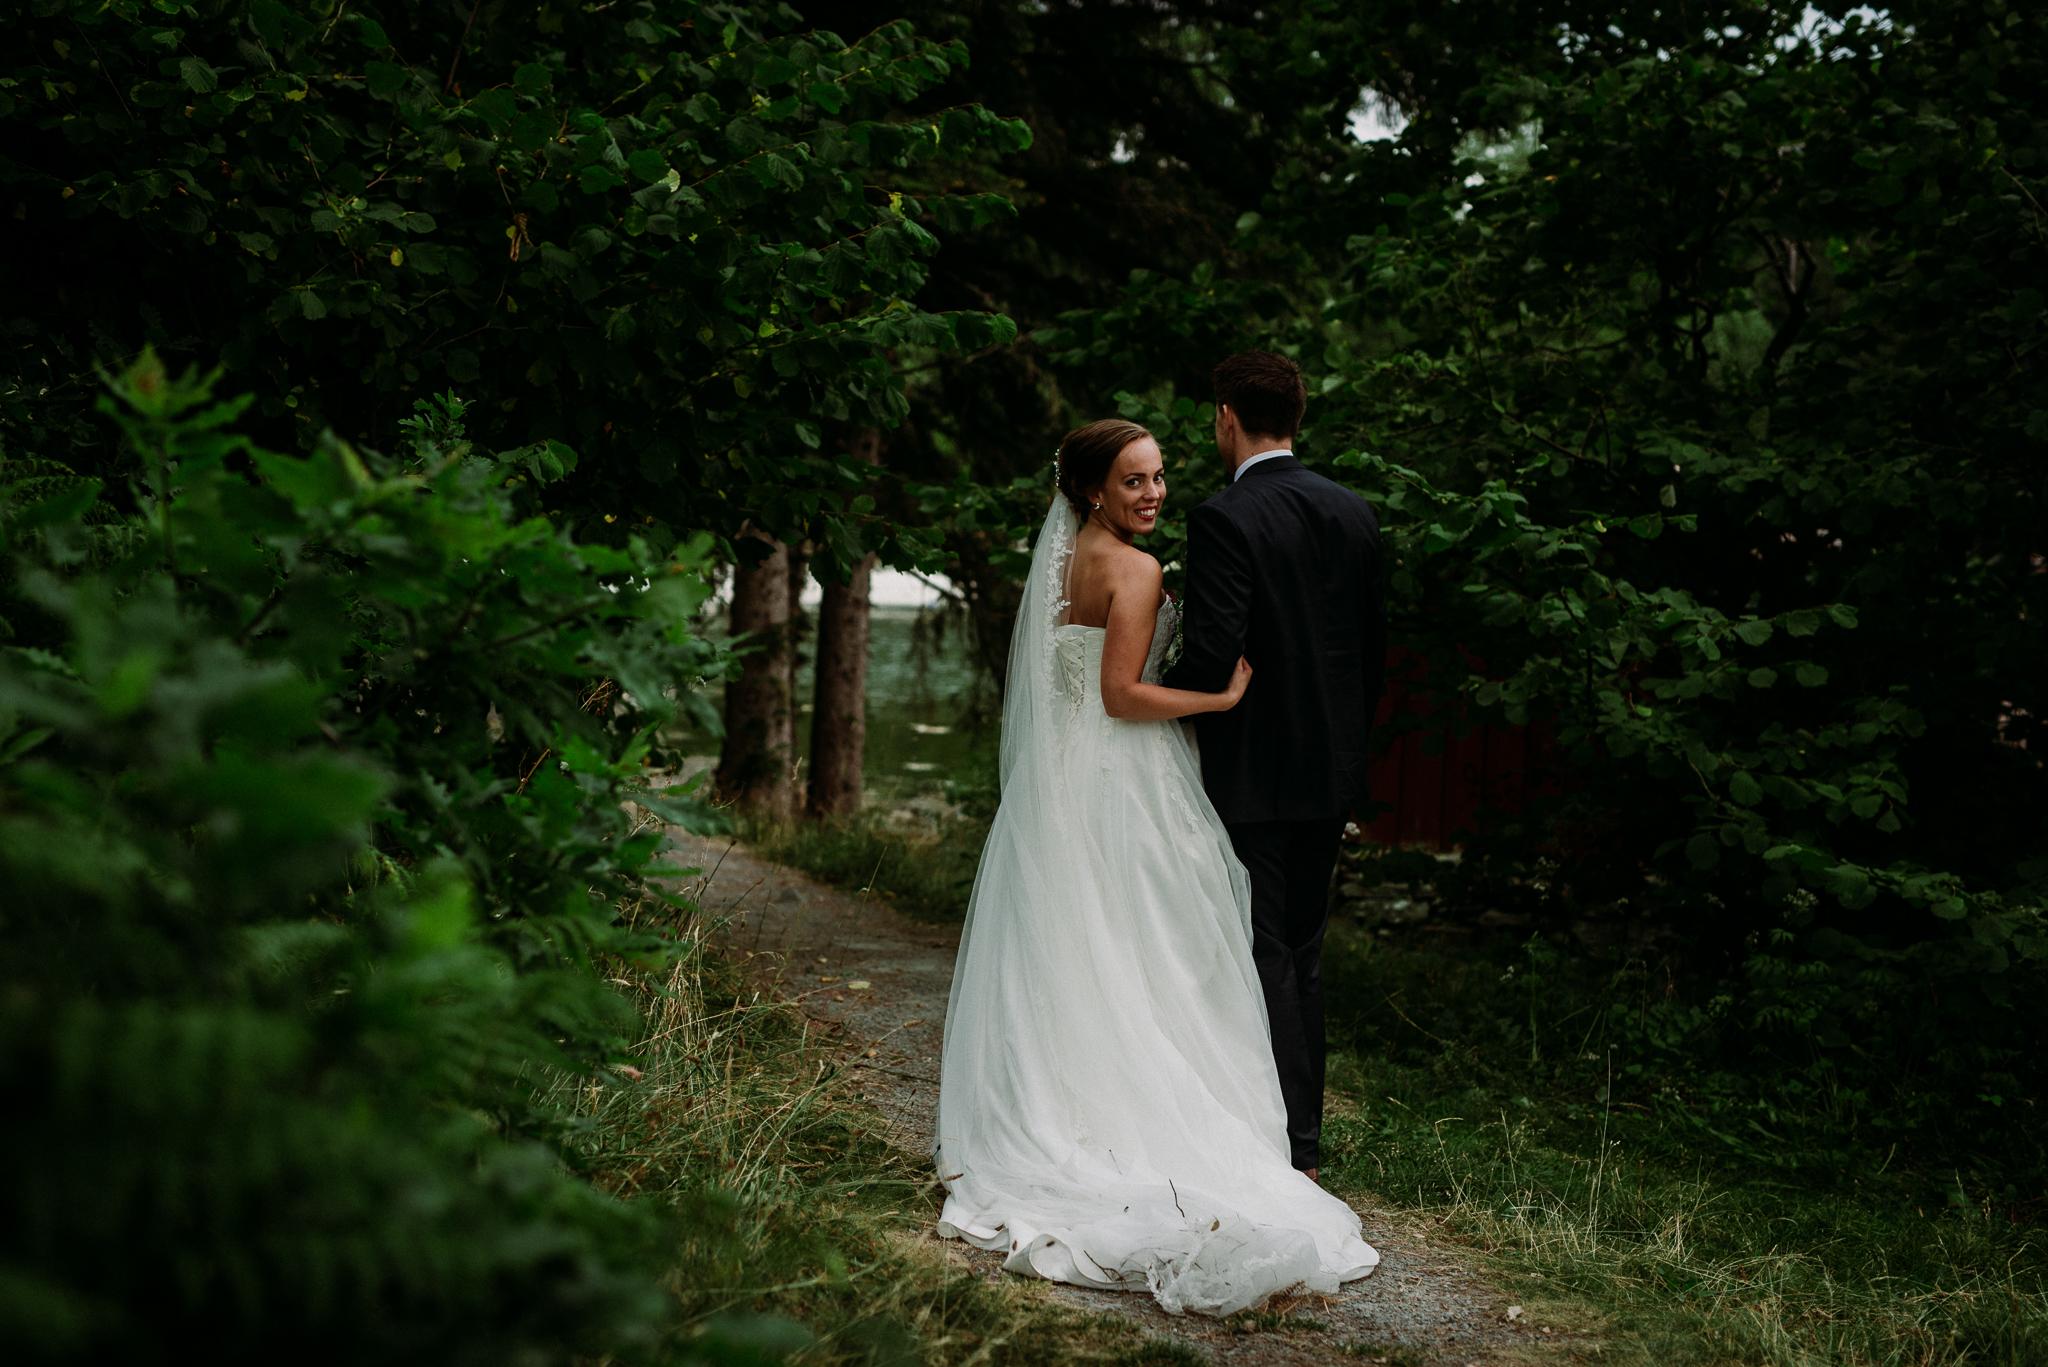 Bryllup-løen-på-sunde-bryllupsfotograf-Stavanger-Lofoten-Bergen-Oslo-31.jpg